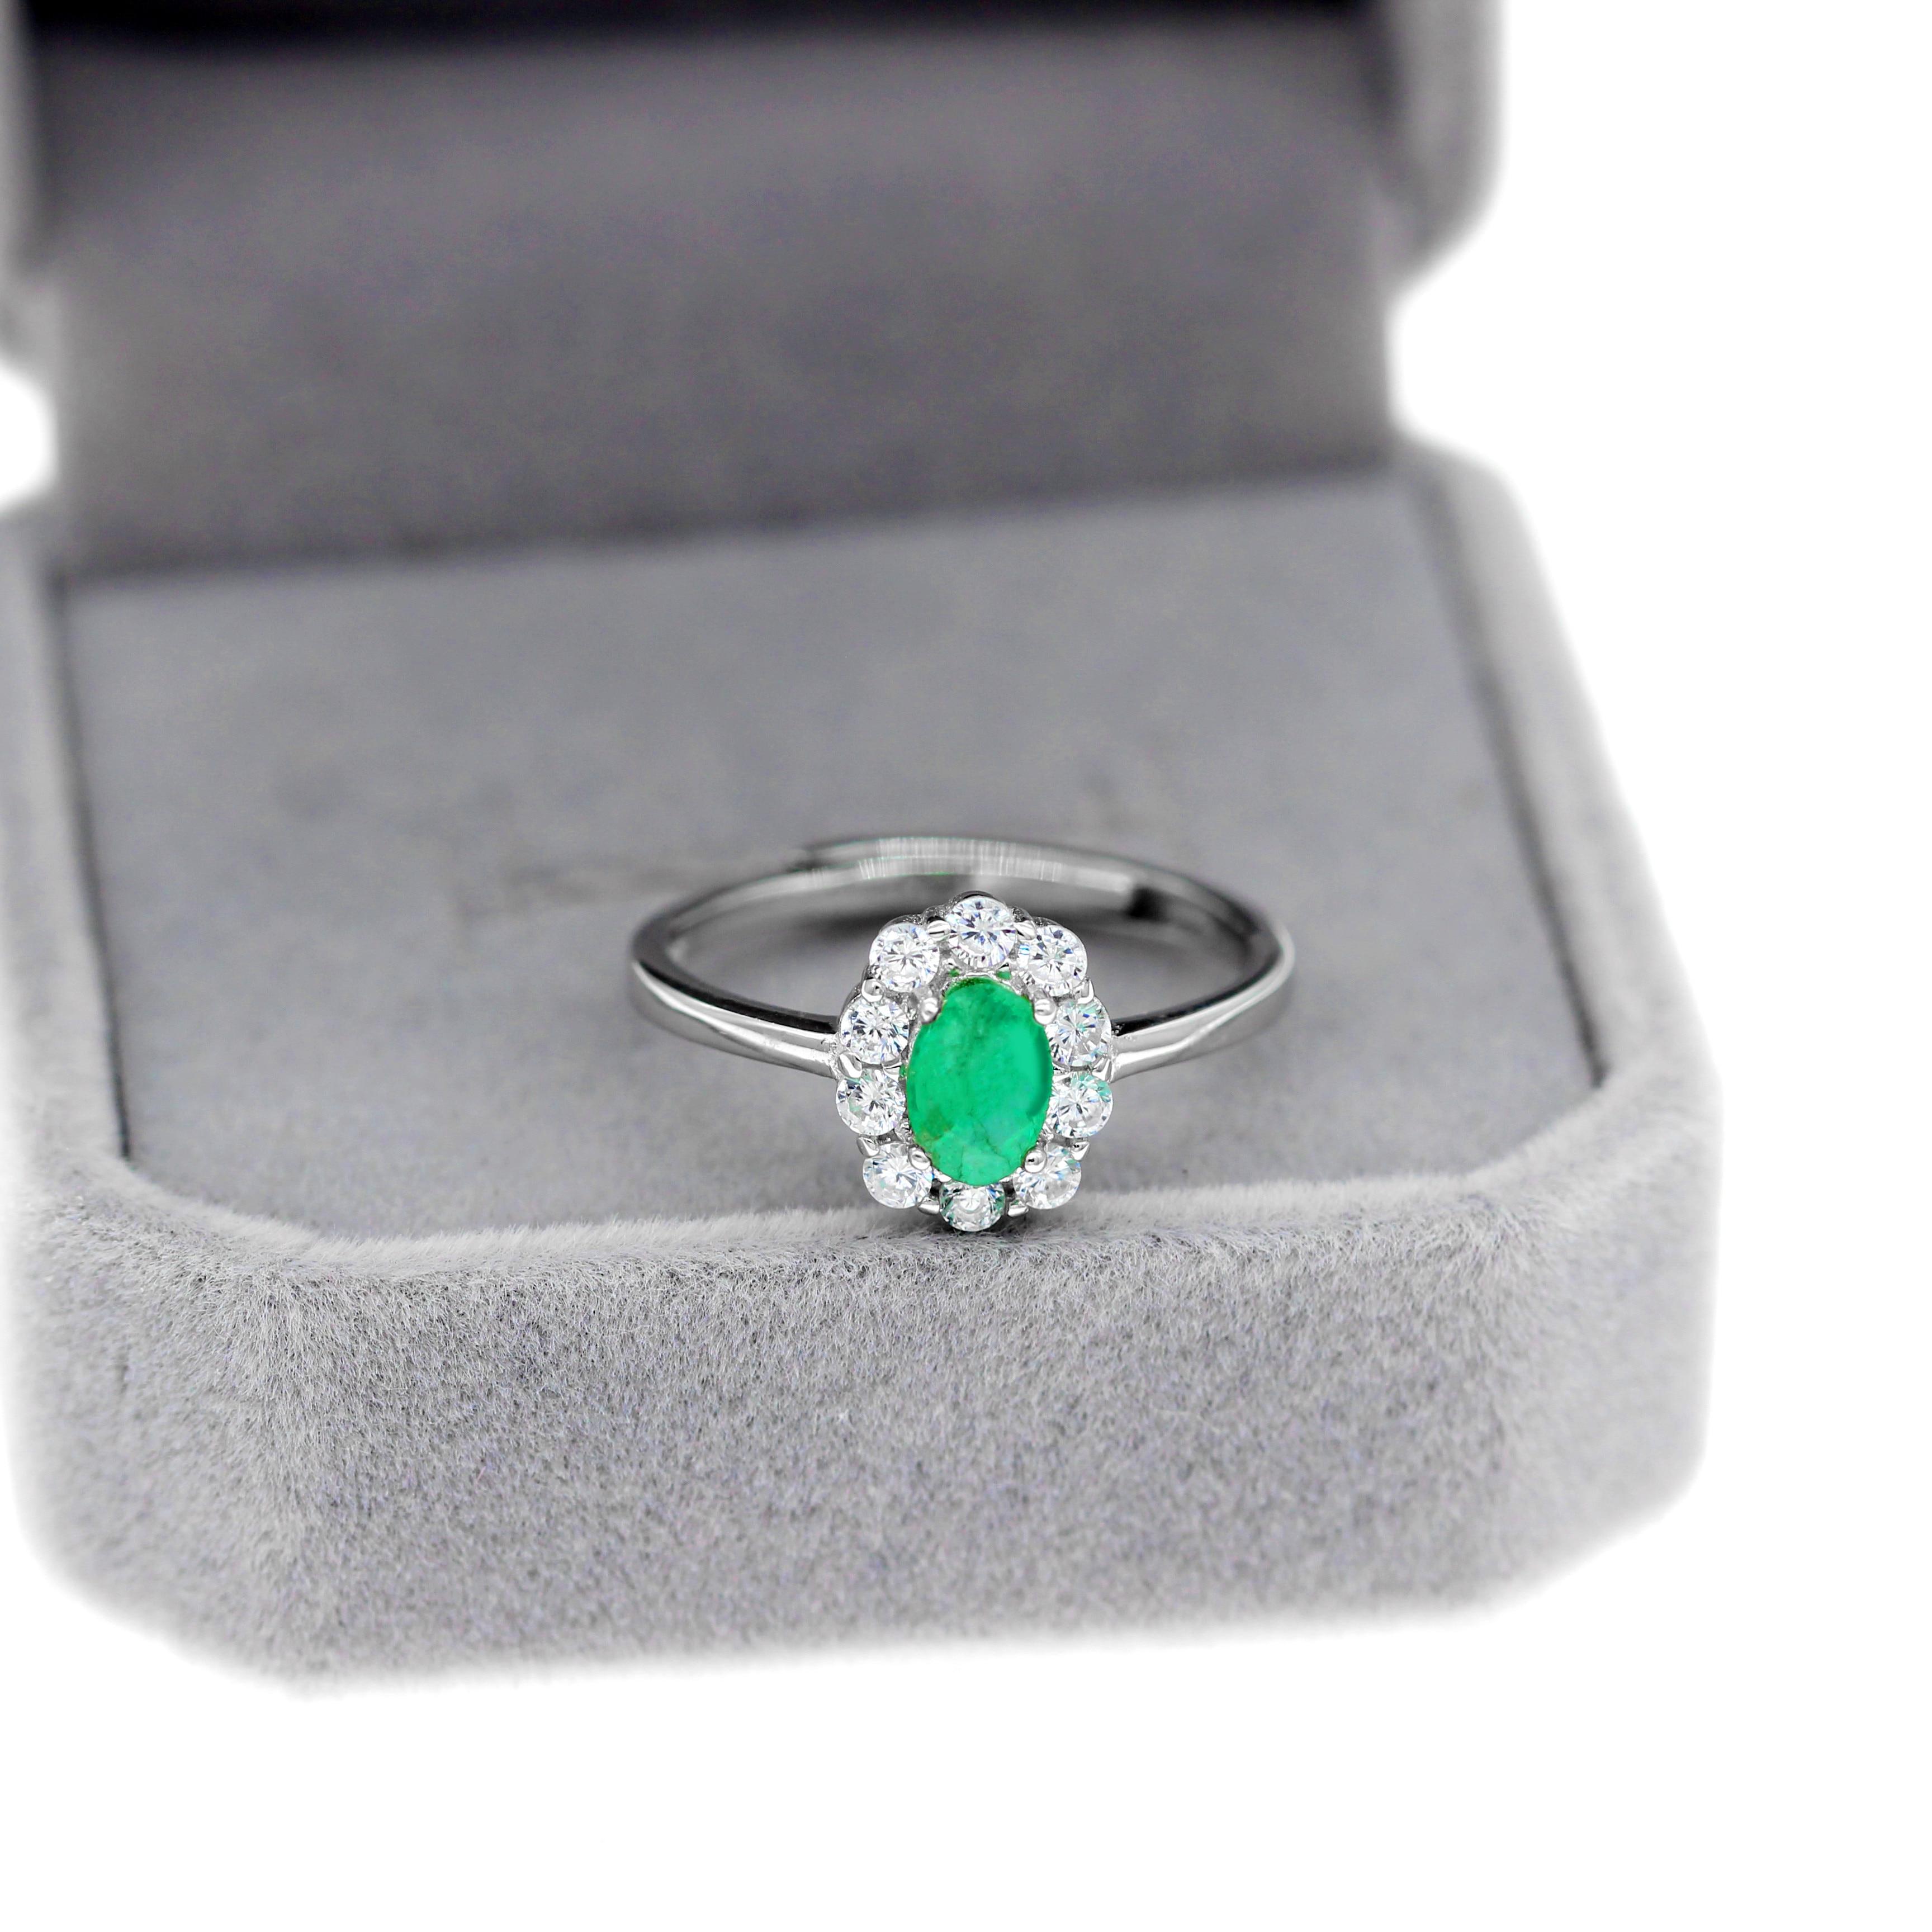 Uloveido Green Emerald Ring, Flower Rings, 925 Sterling Silver, 4*6mm Certified Gemstone Engagement Wedding Jewelry for Women